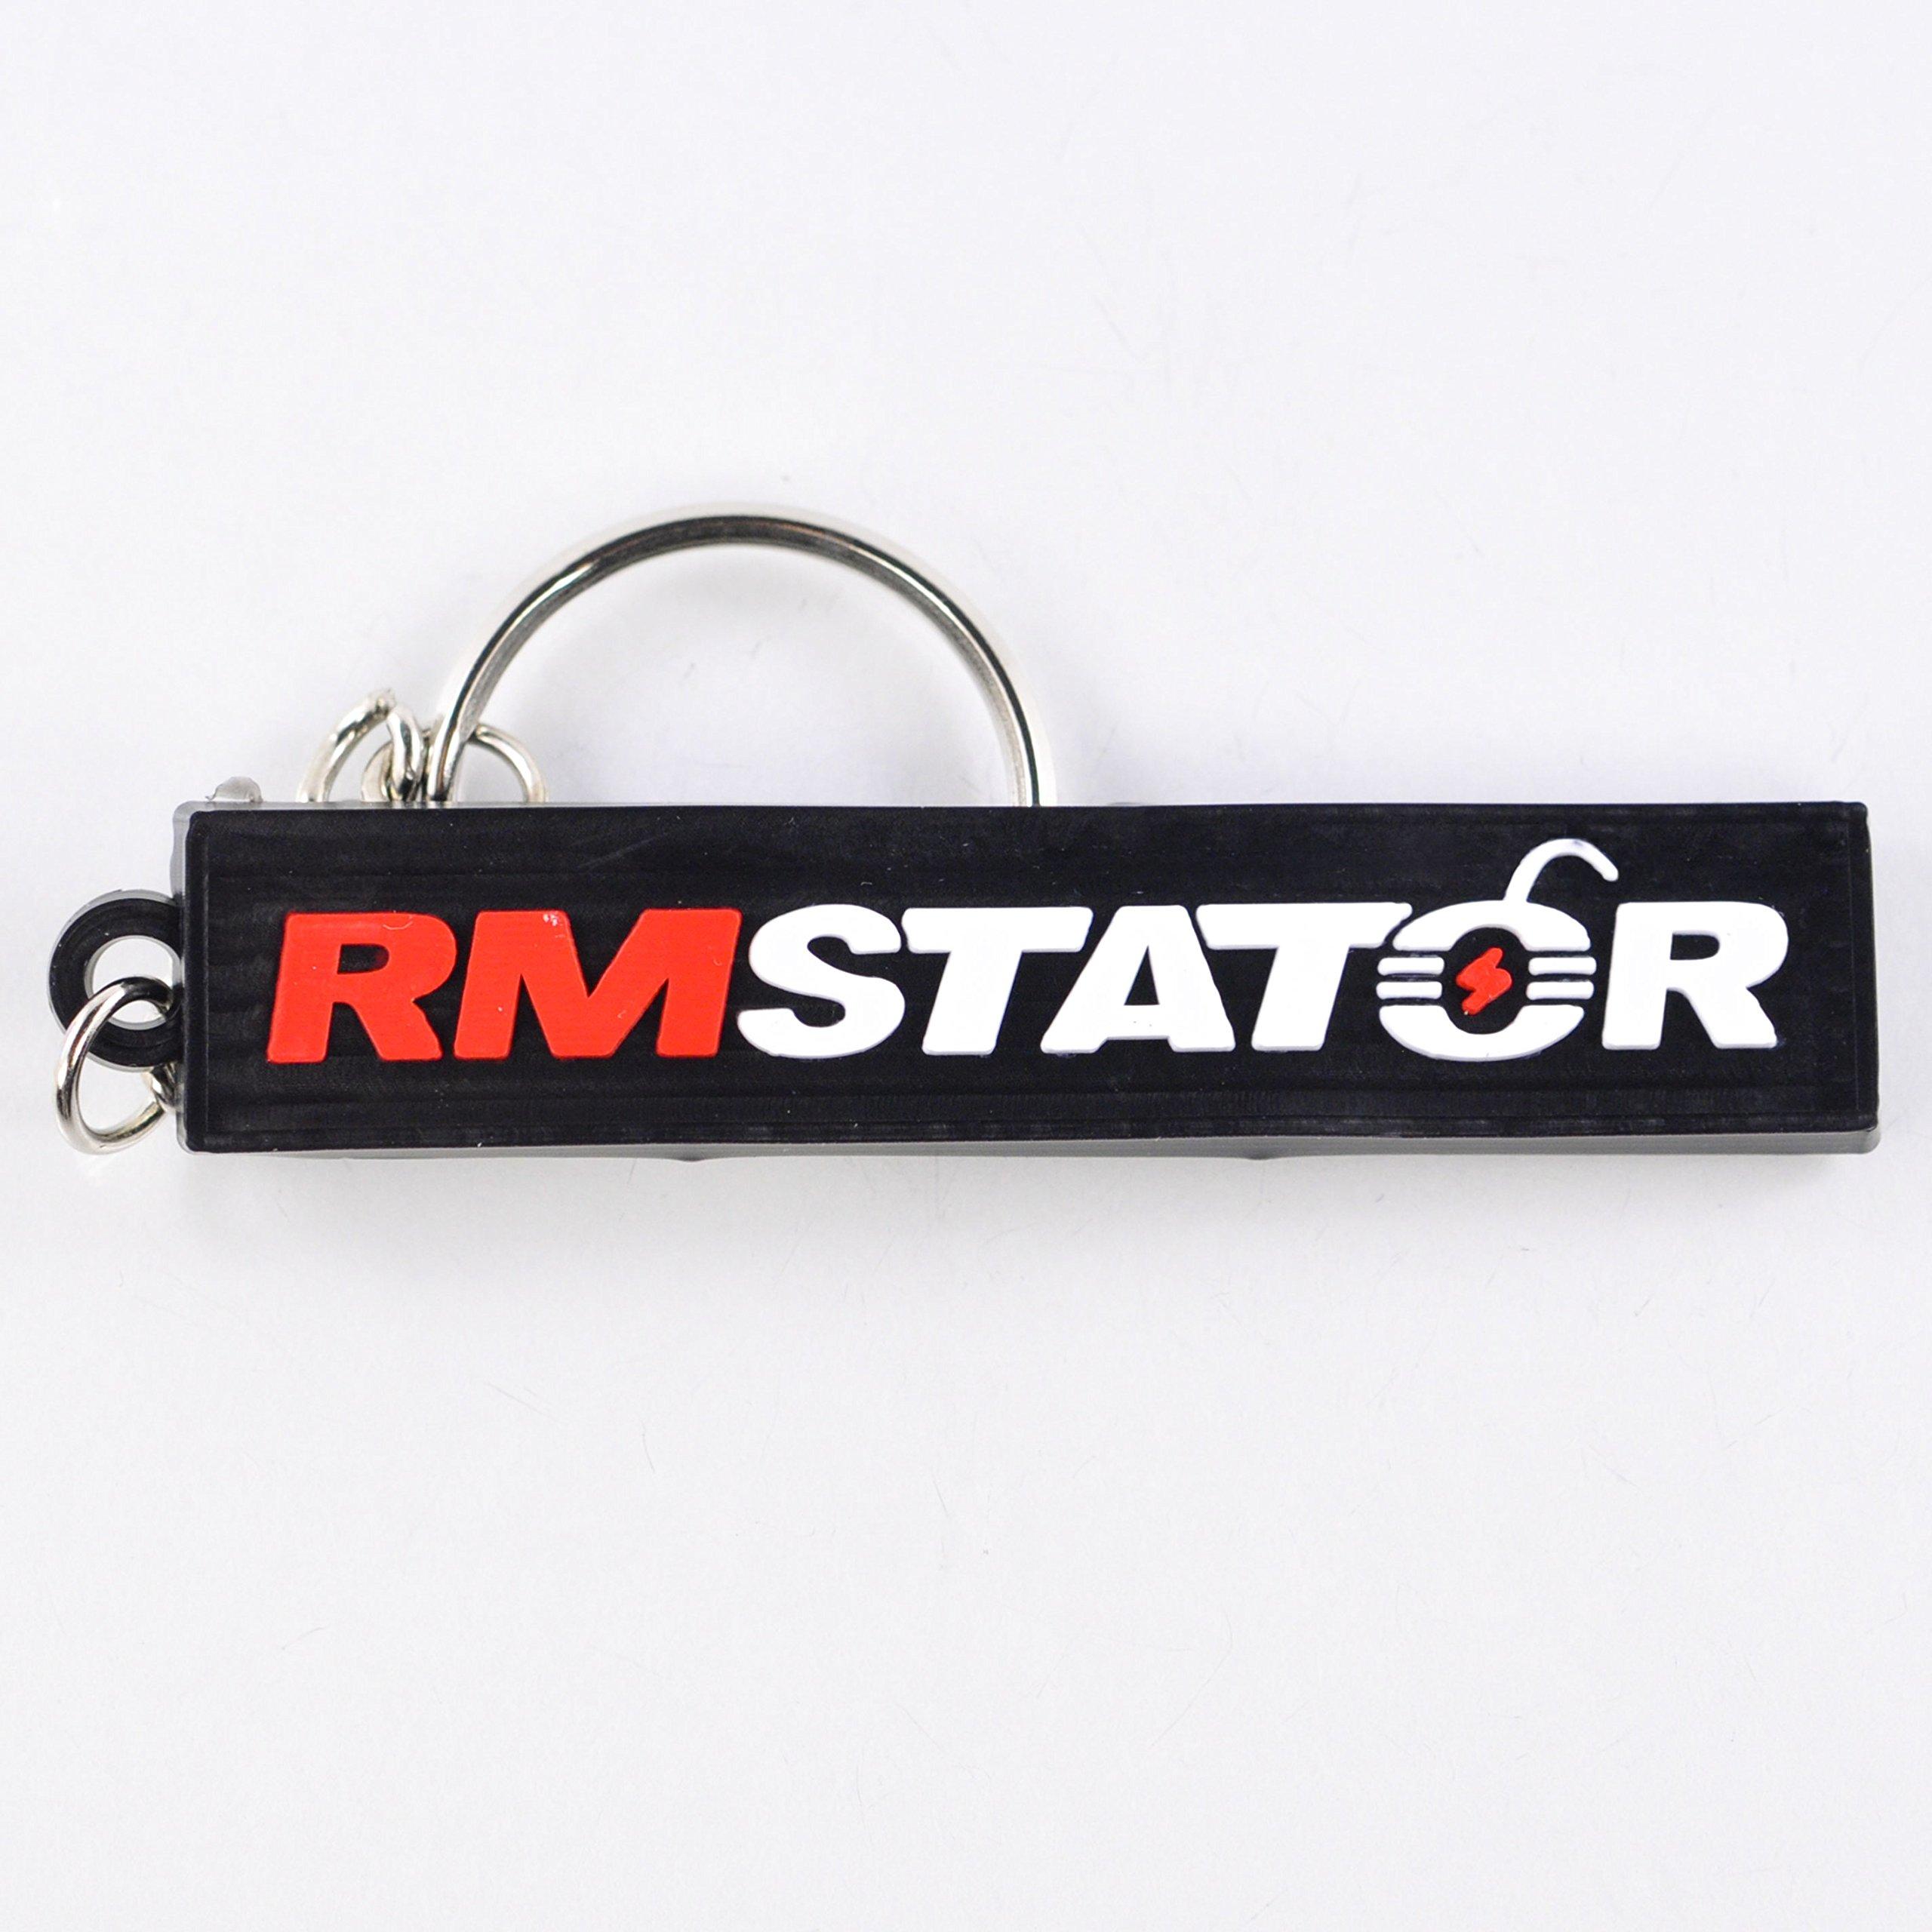 Stator Pick-Up Pulsar Coil For Polaris Ranger Scrambler Sportsman Honda KTM Suzuki 1984-2014 OEM Repl. 3084974 3085360 31120-KA4-741 by RMSTATOR (Image #5)